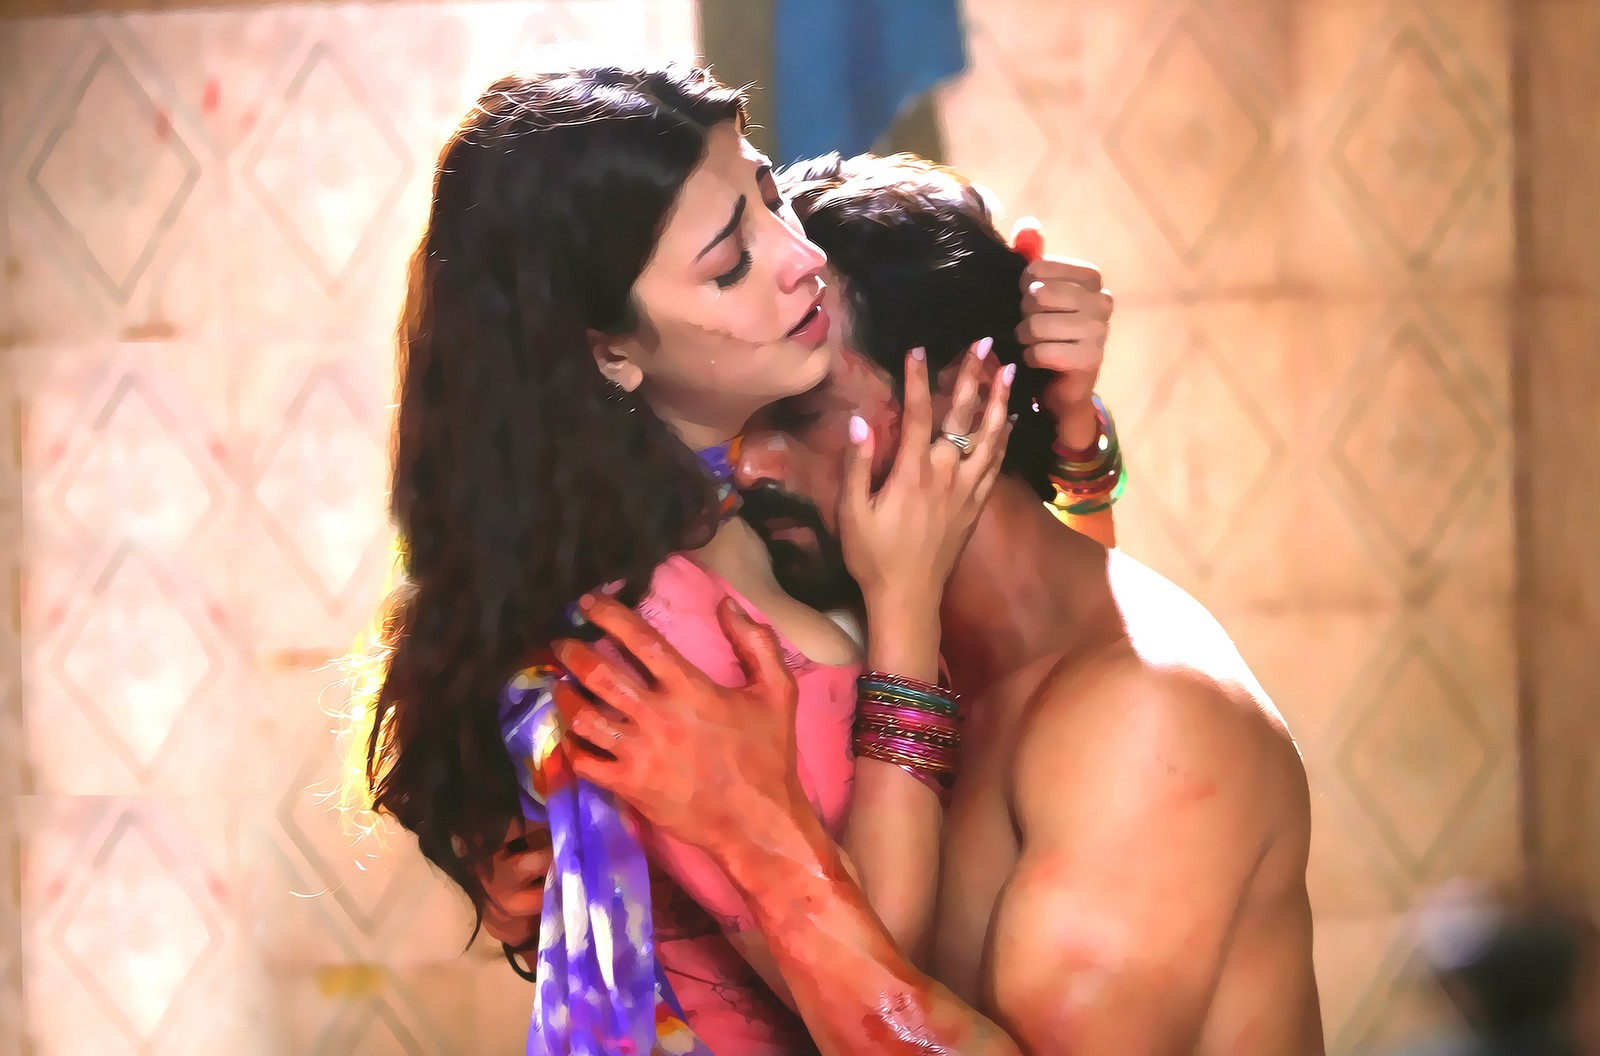 shruti haasan gelupu gurram movie hot stills | 25cineframes